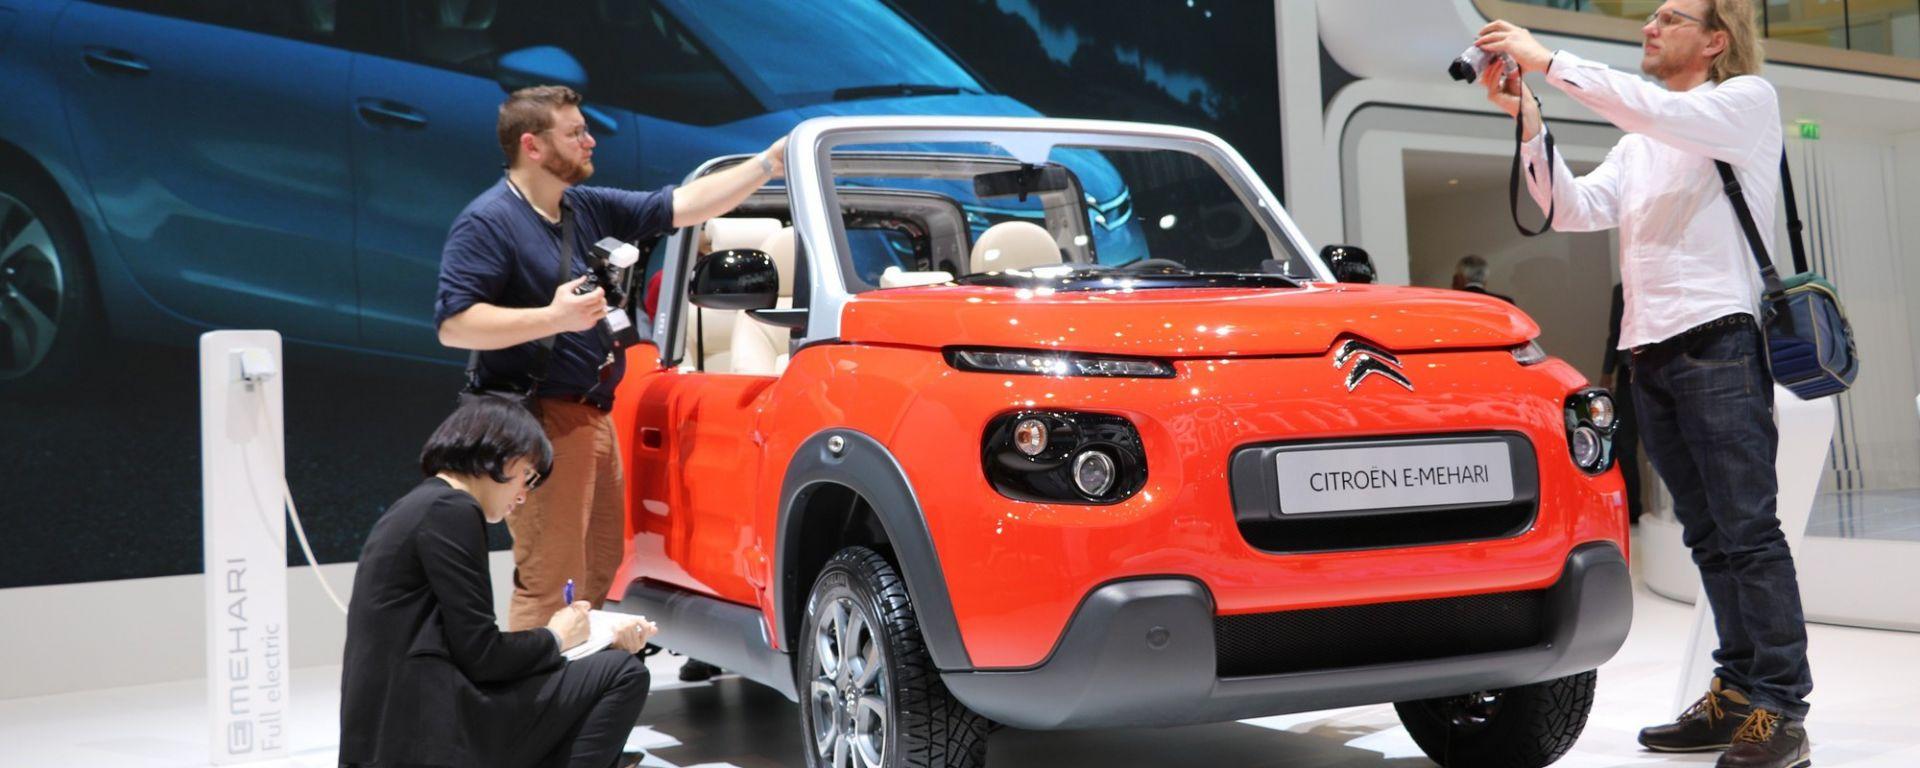 Ginevra 2016 - Notizie dalle Case: Citroën